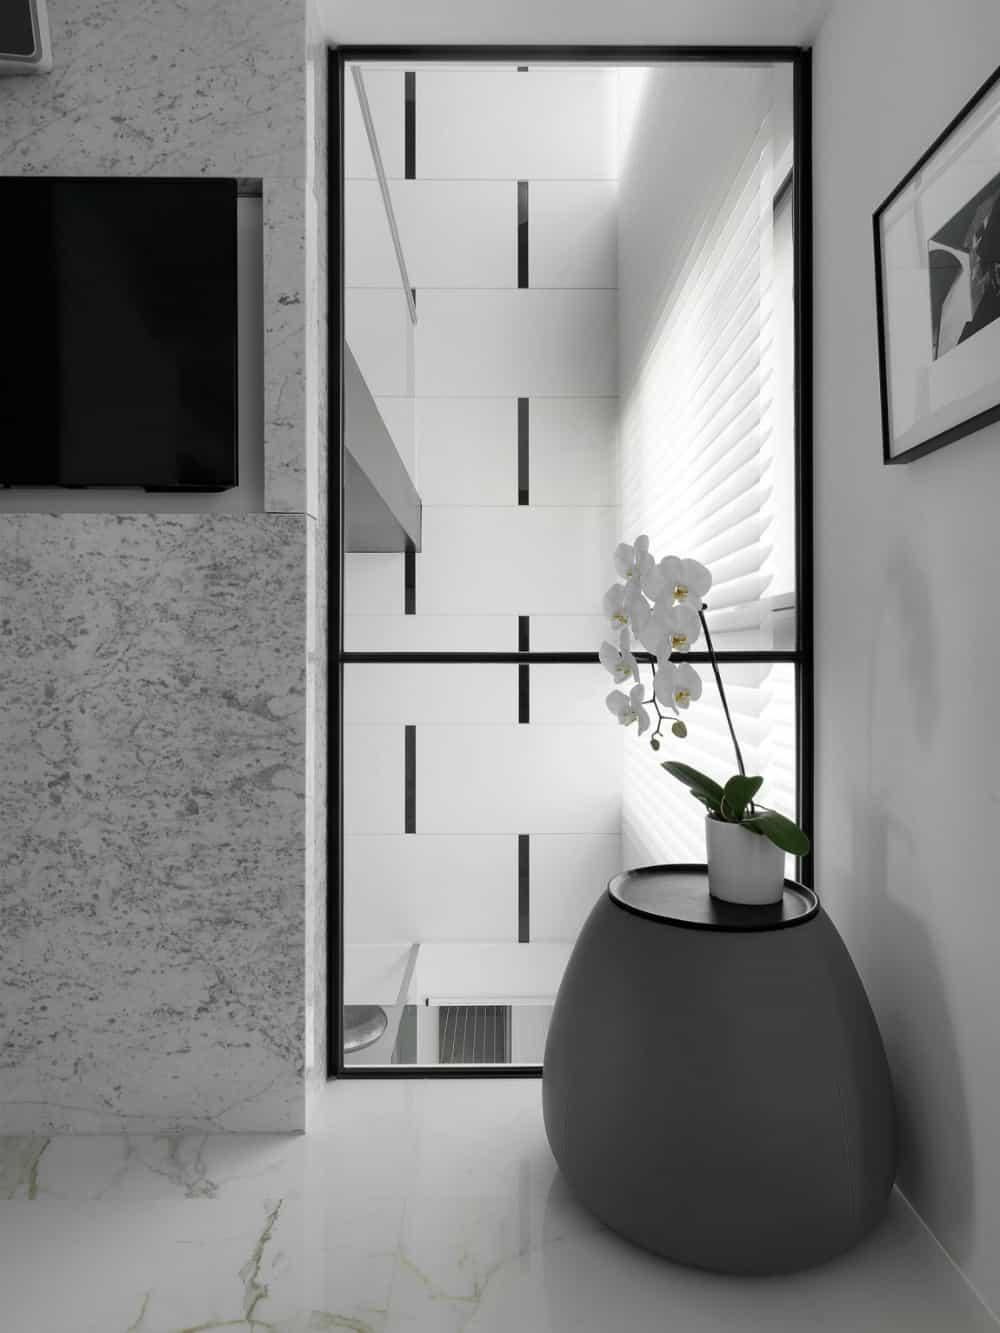 Glazed wall inclusions